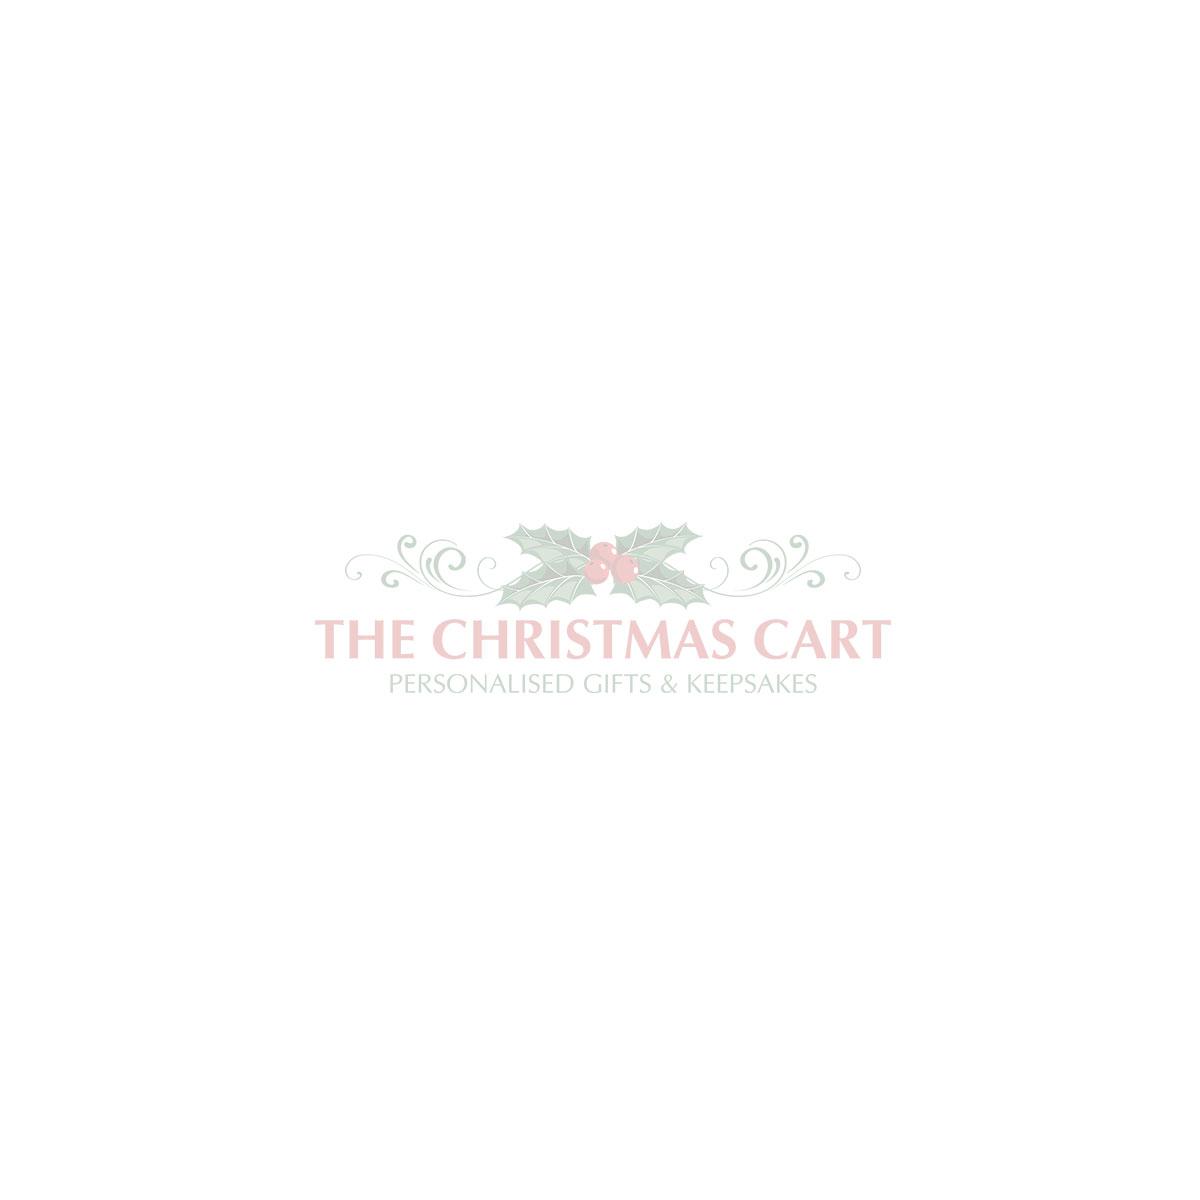 LED Fairy Lights 400pc - Warm White on